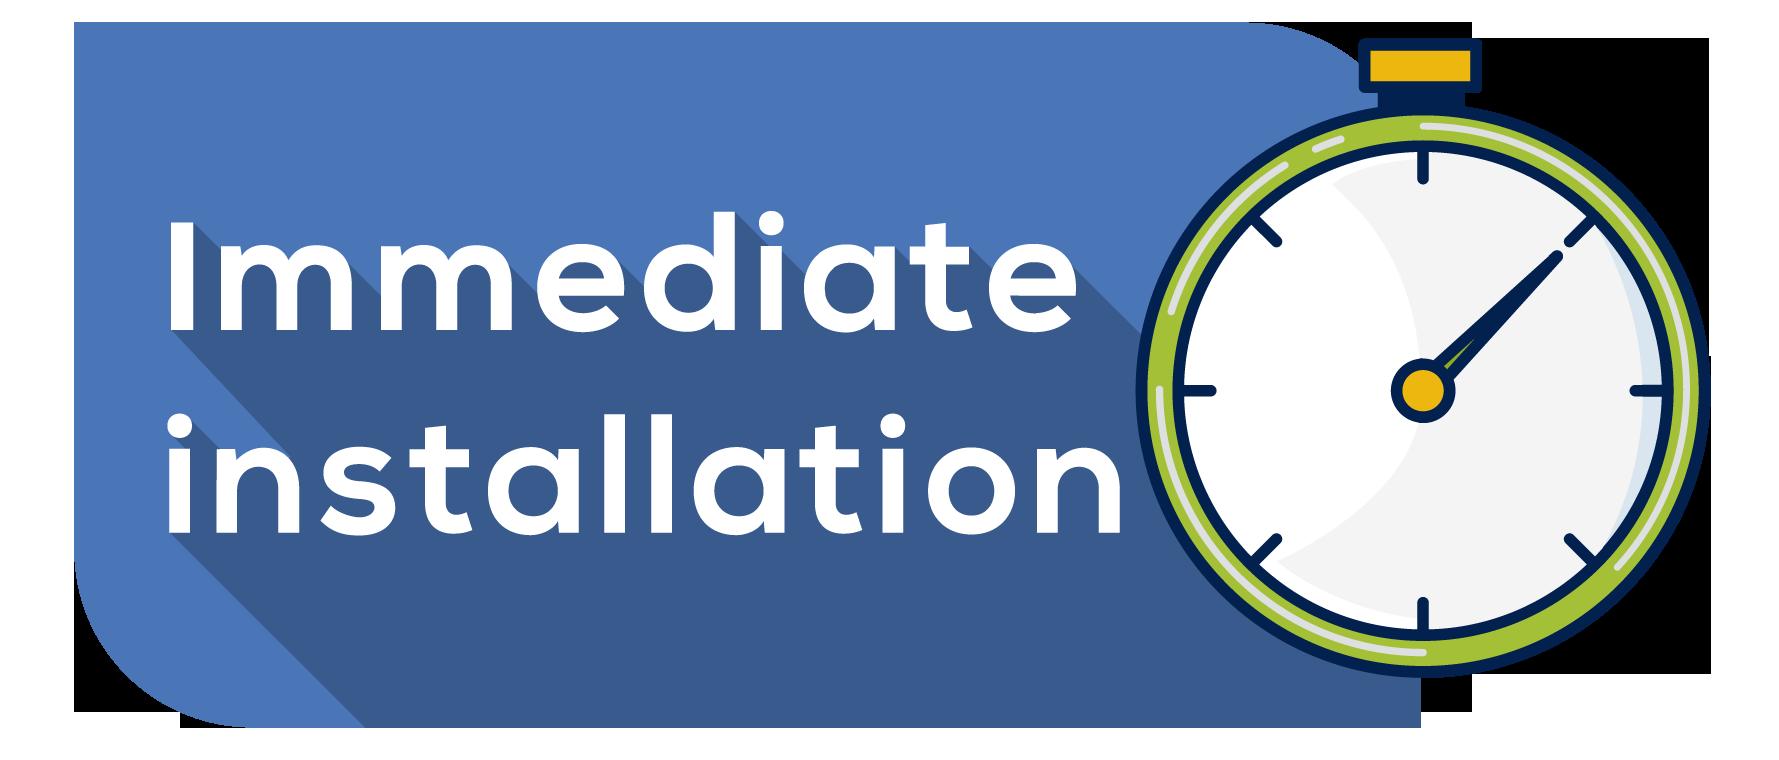 immediate-installation-3